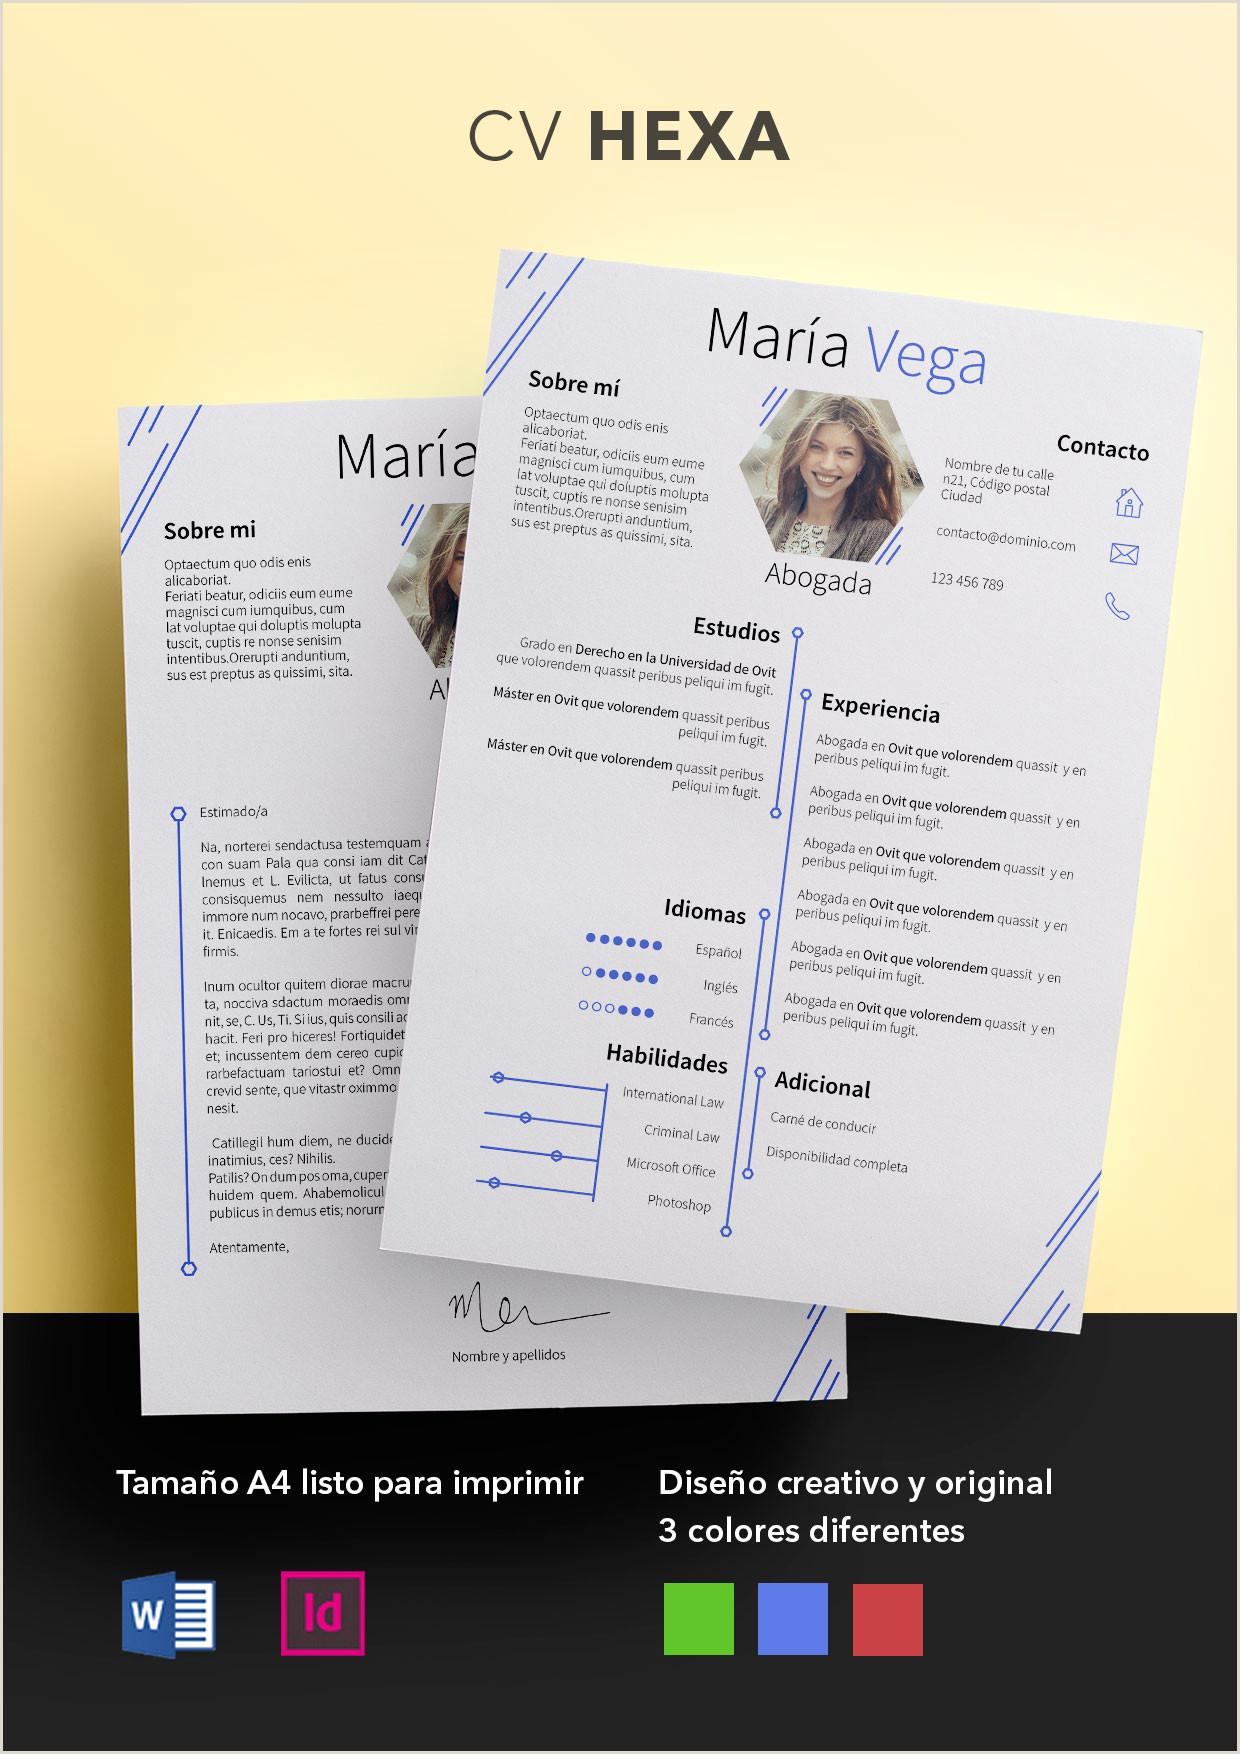 Formato De Curriculum Vitae Creativo Para Rellenar Currculum Vitae Modelo Hexa